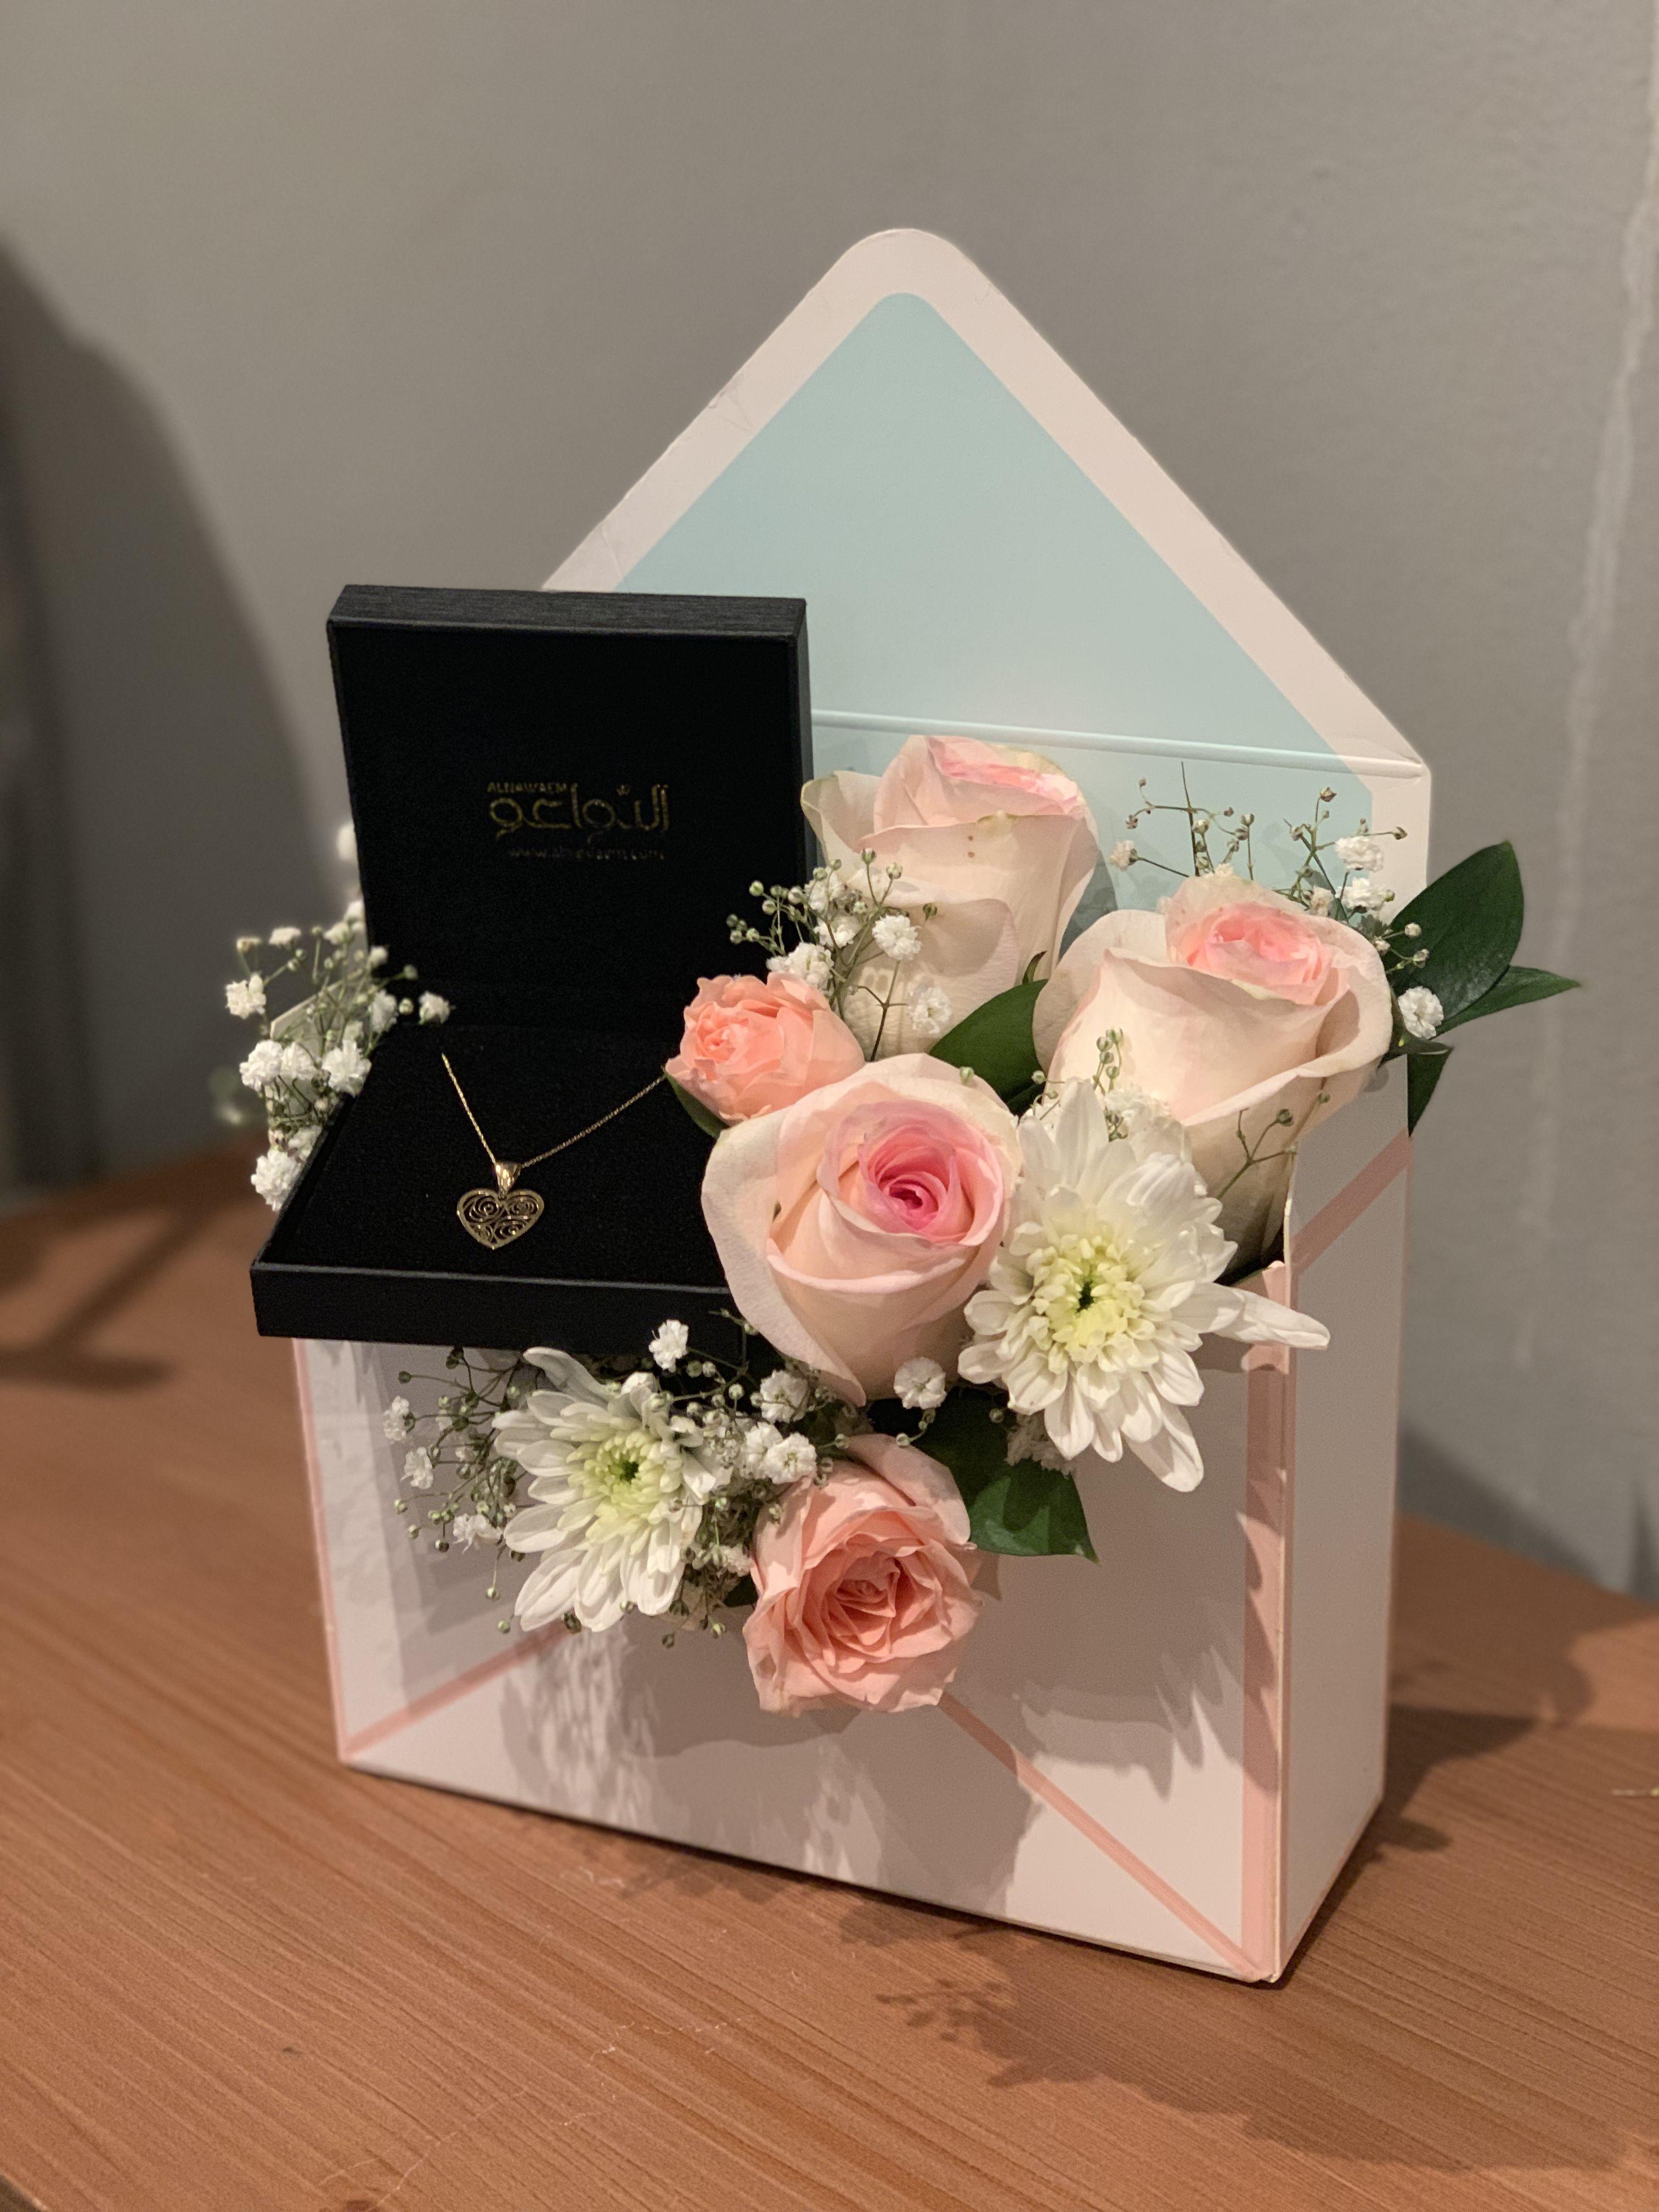 Arrangement Wedding Gifts Packaging Flower Box Gift Wedding Gift Pack